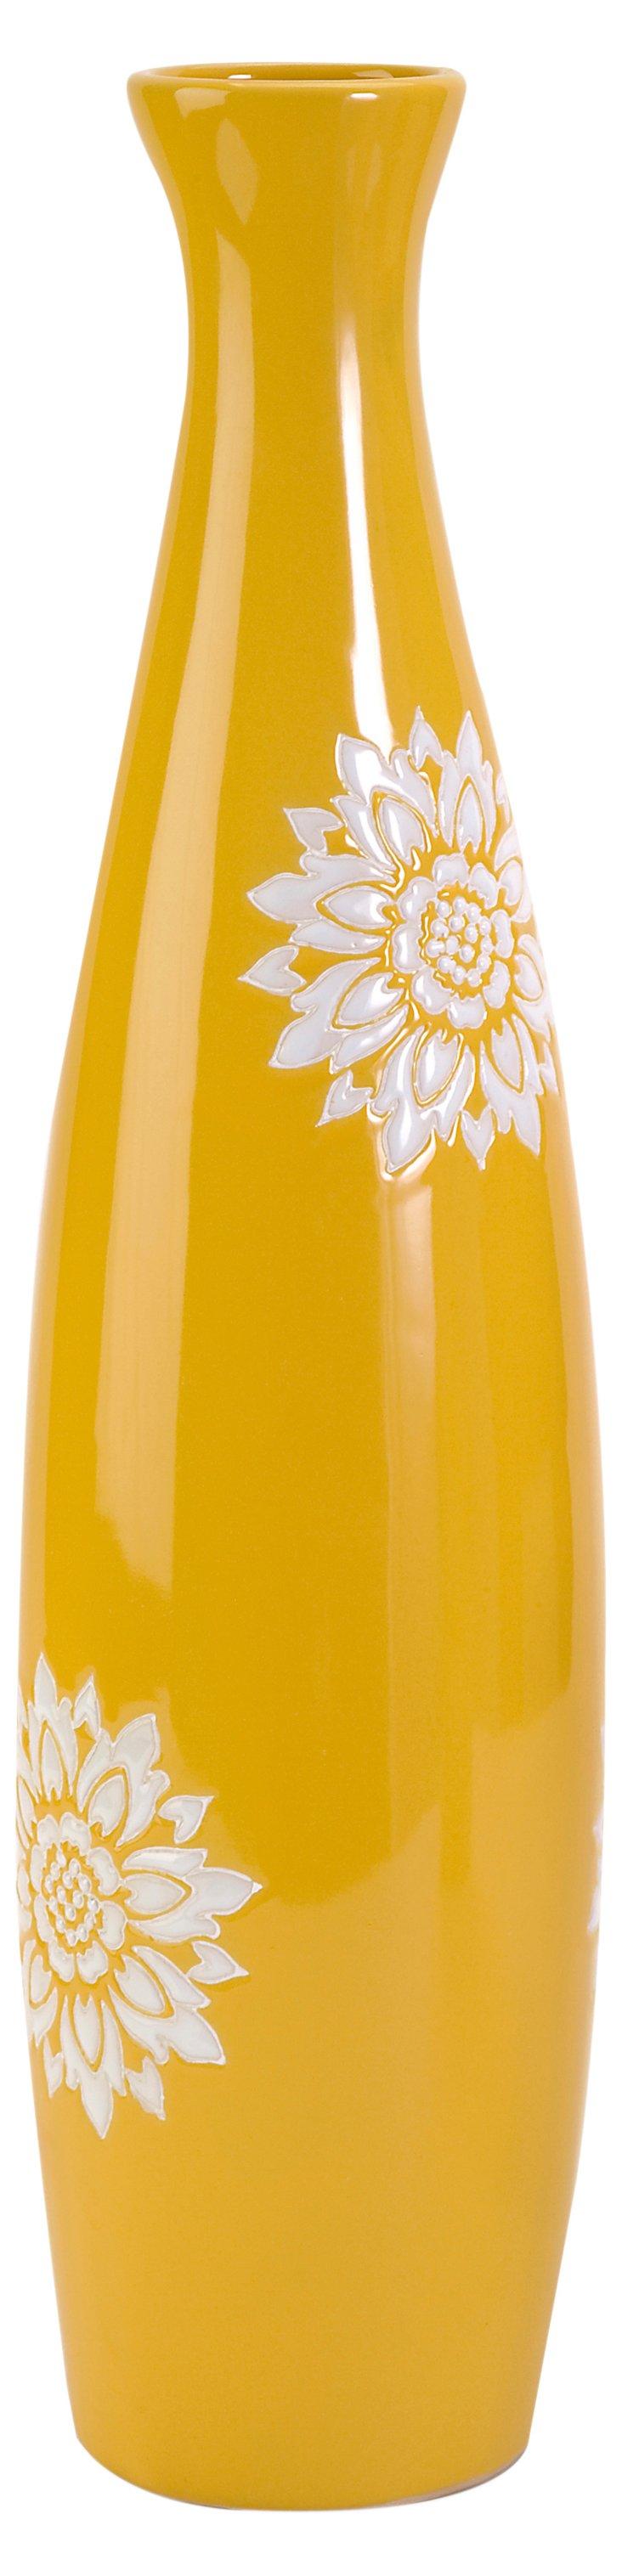 Essentials Yellow Tall Vase